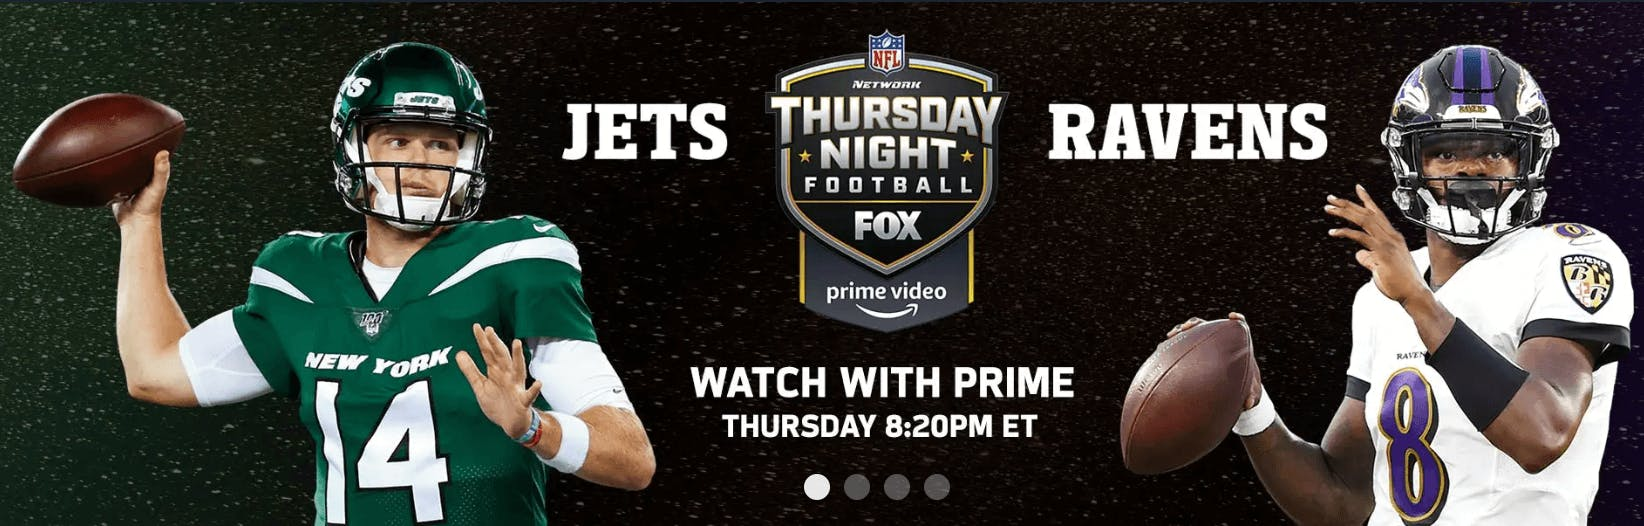 ravens jets amazon prime streaming football nfl